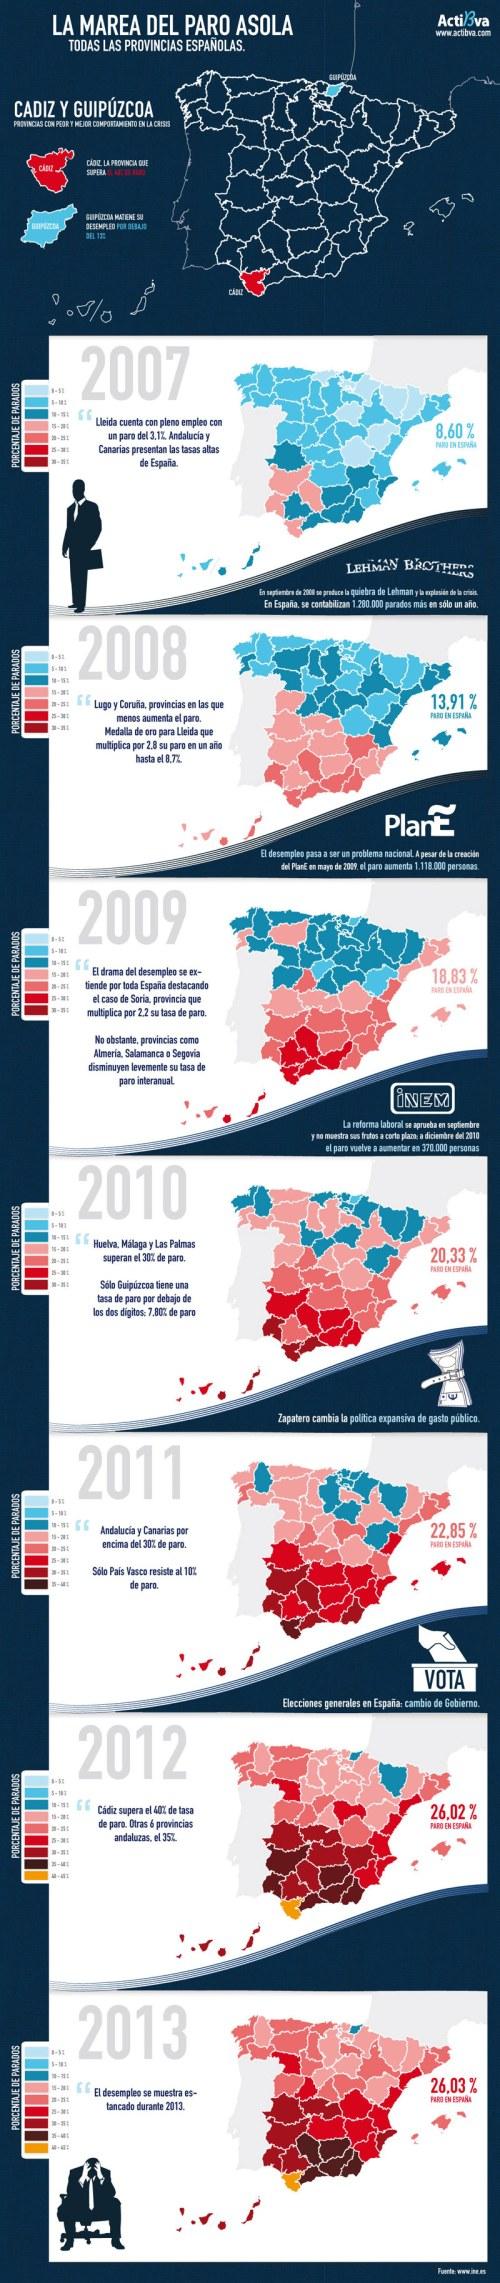 mapas-paro-epa-provinciales